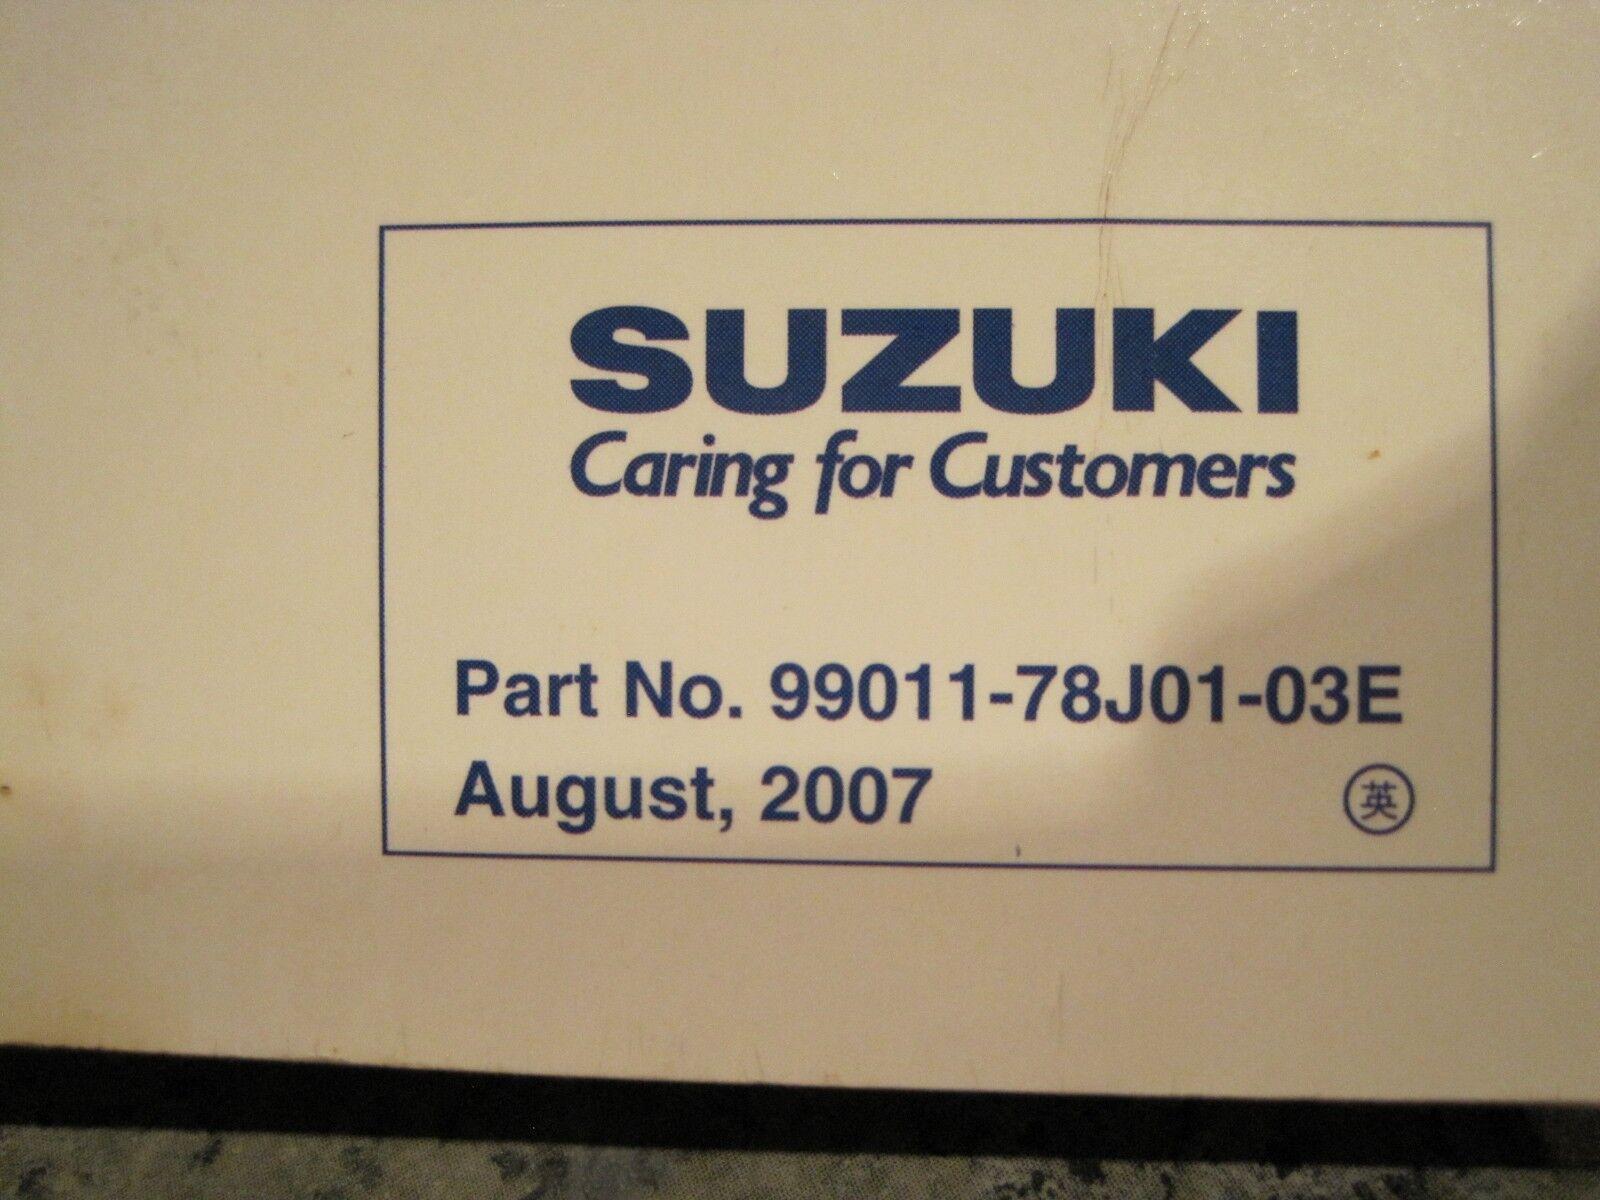 2008 suzuki sx4 owner manual [ 1600 x 1200 Pixel ]